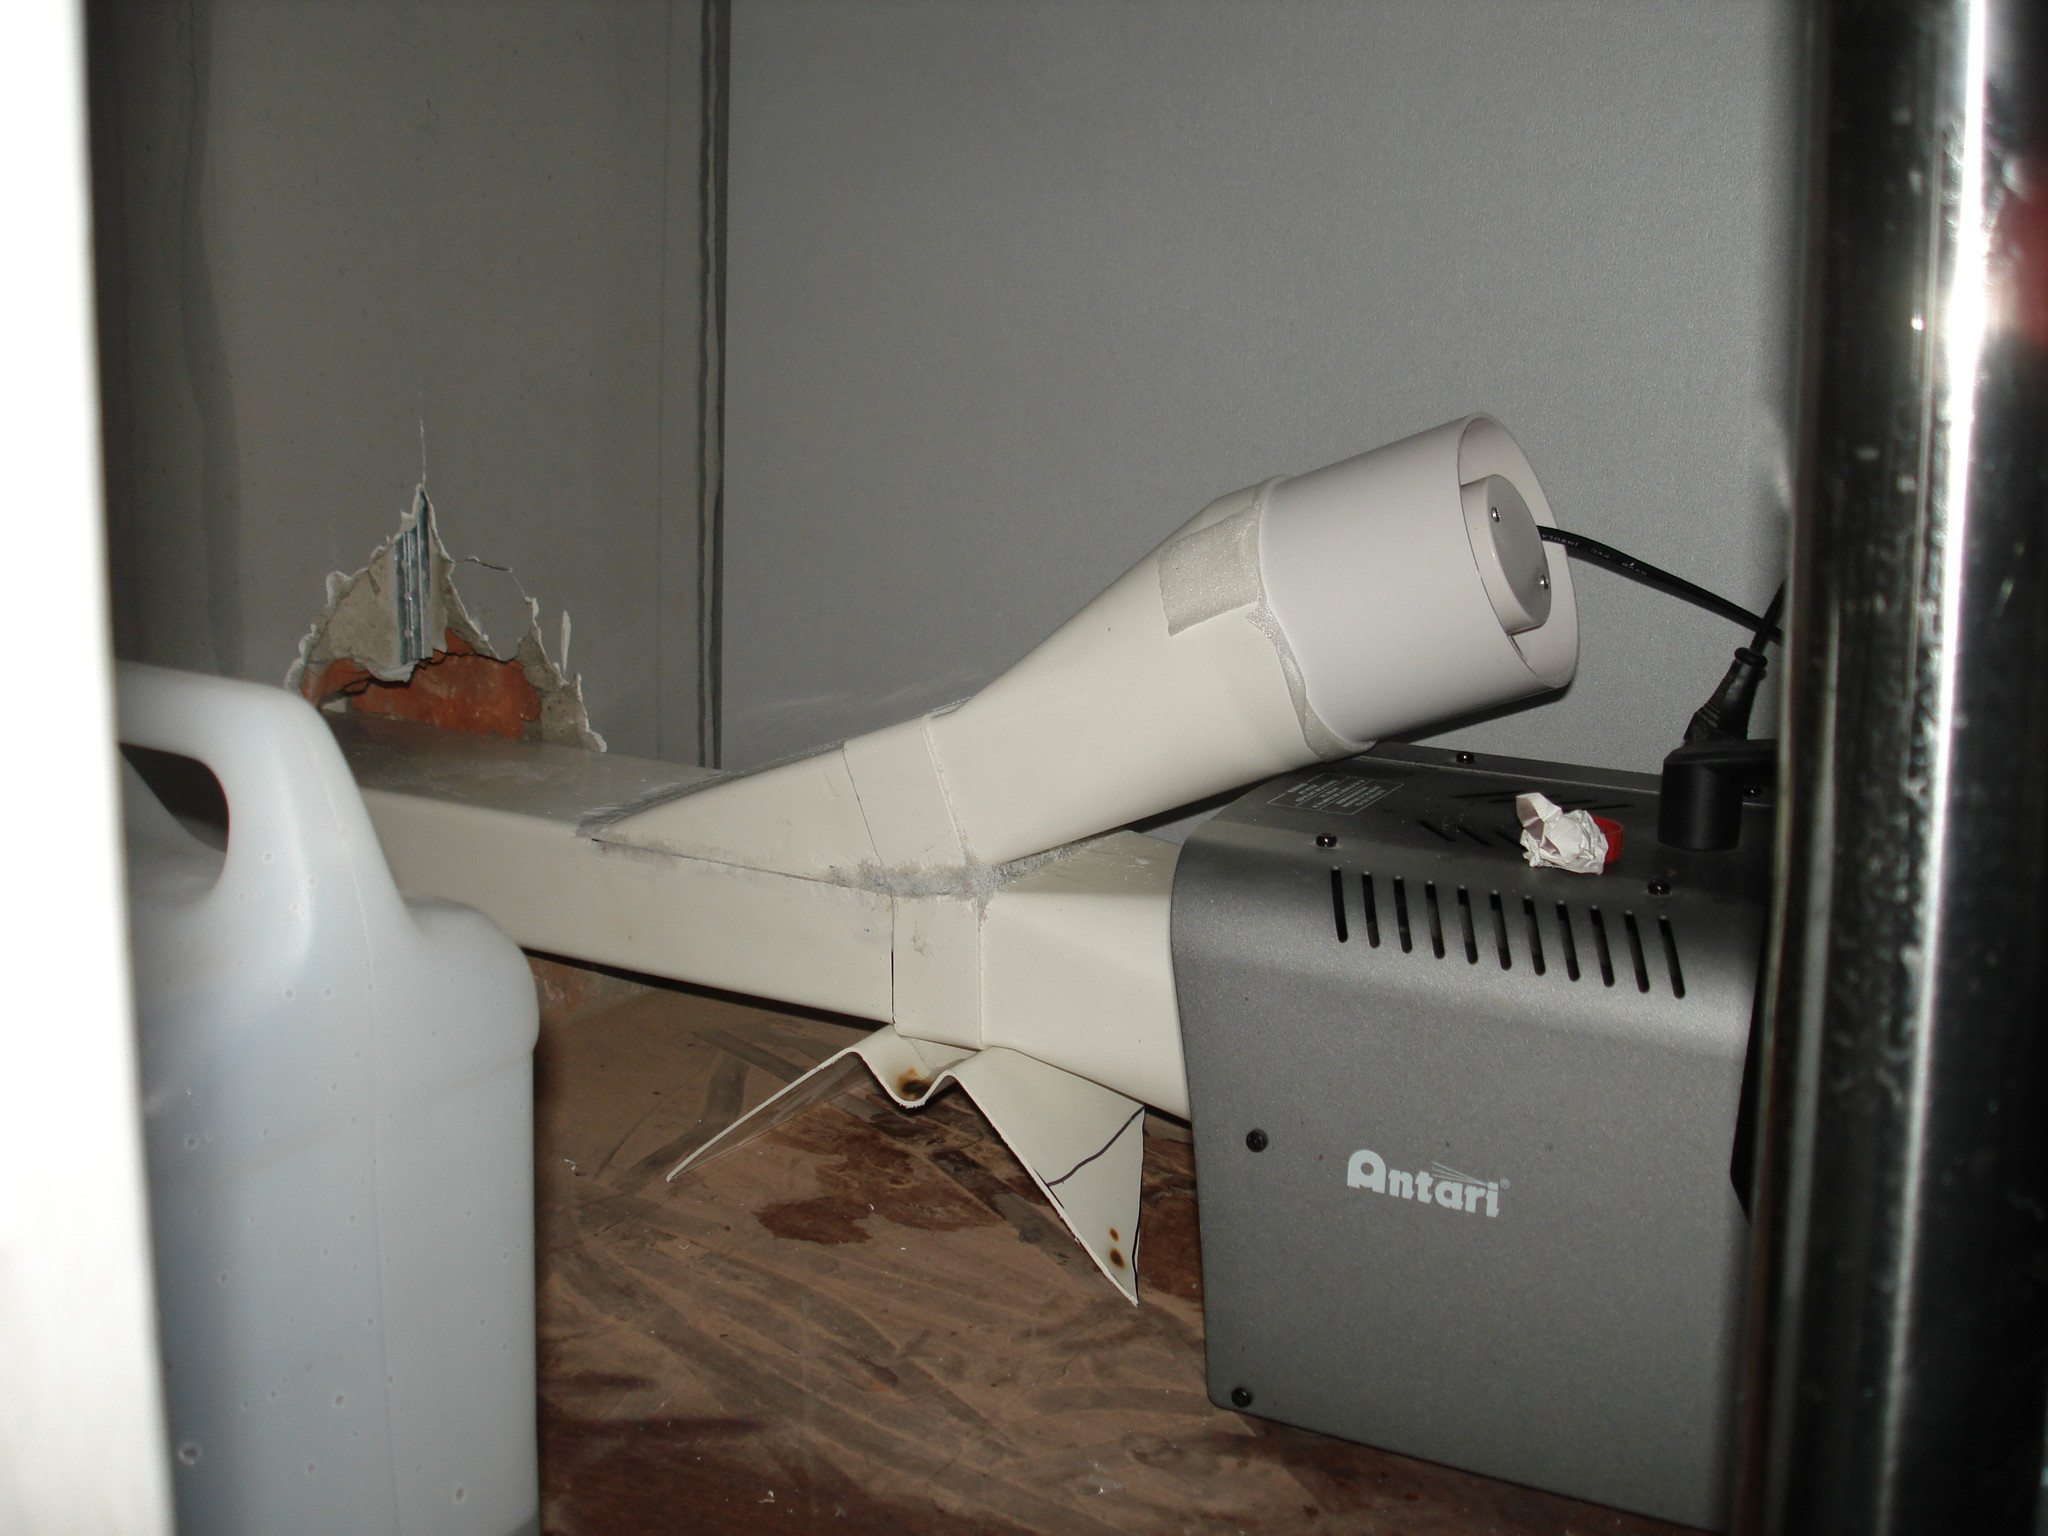 s-1005.JPG